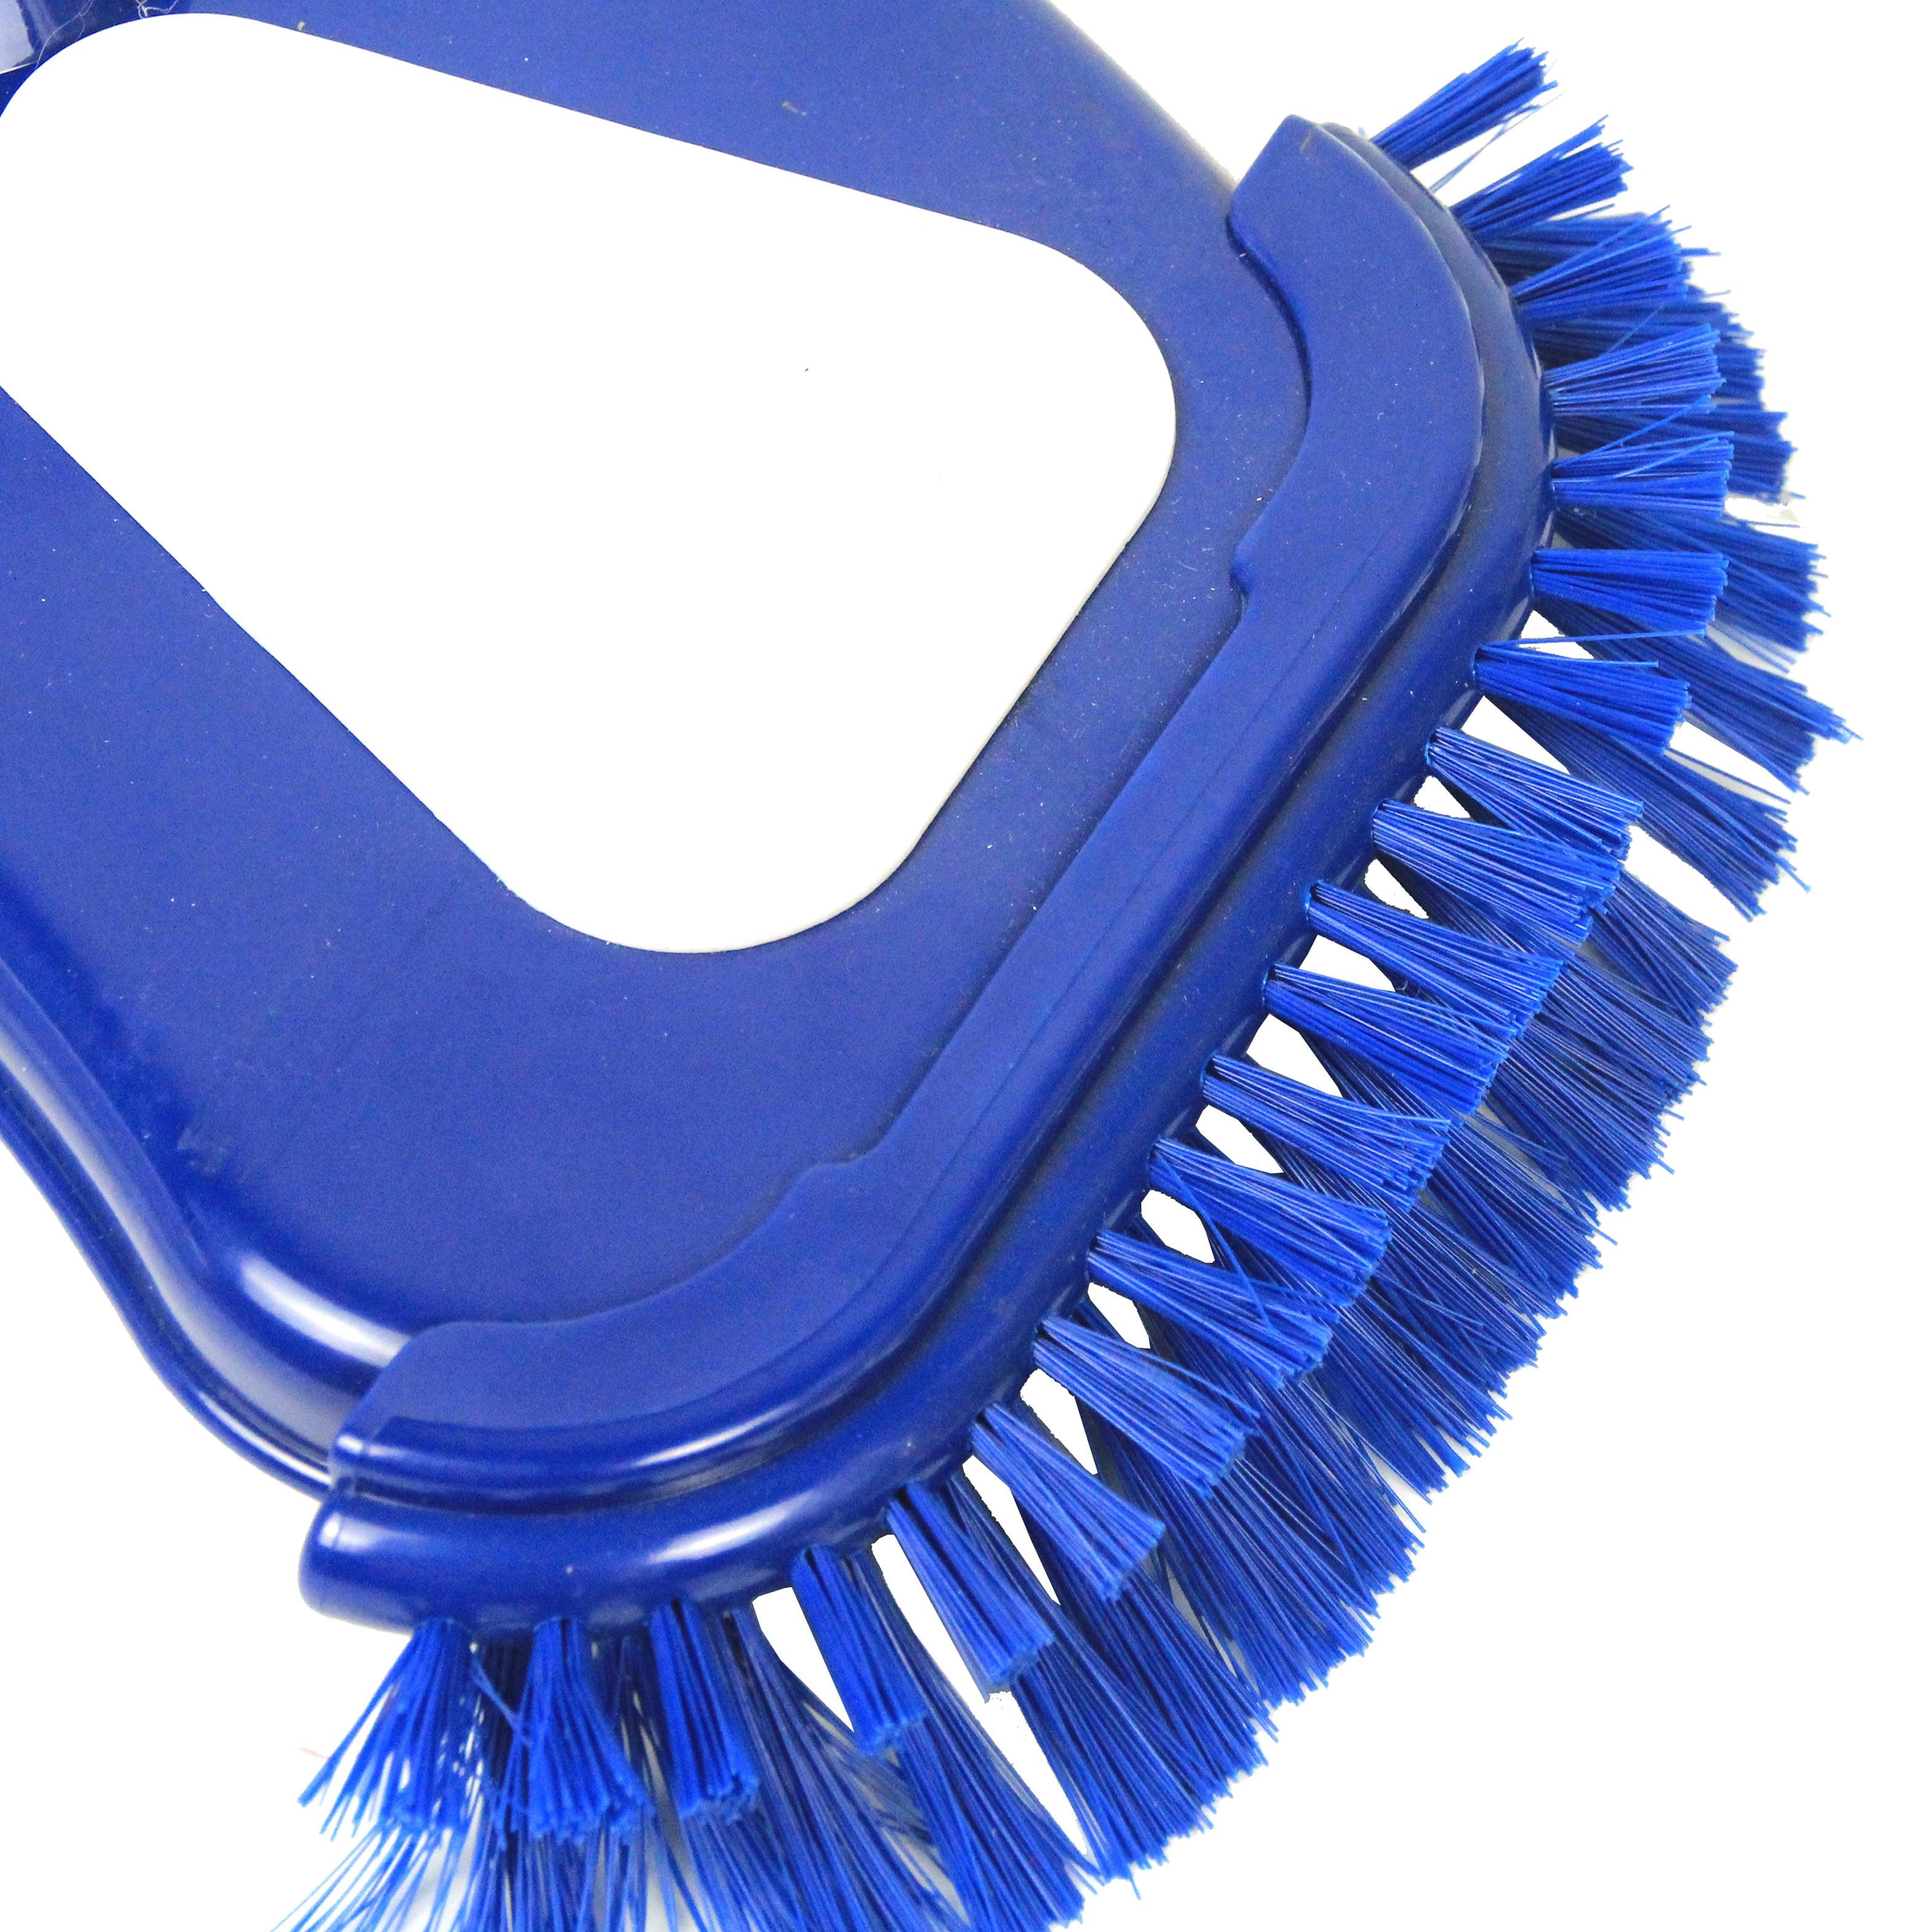 Happy Hot Tubs 3 HEAD SWIMMING POOL Cleaning Kit Triangular Vacuum Head Deep Net Wall Brush